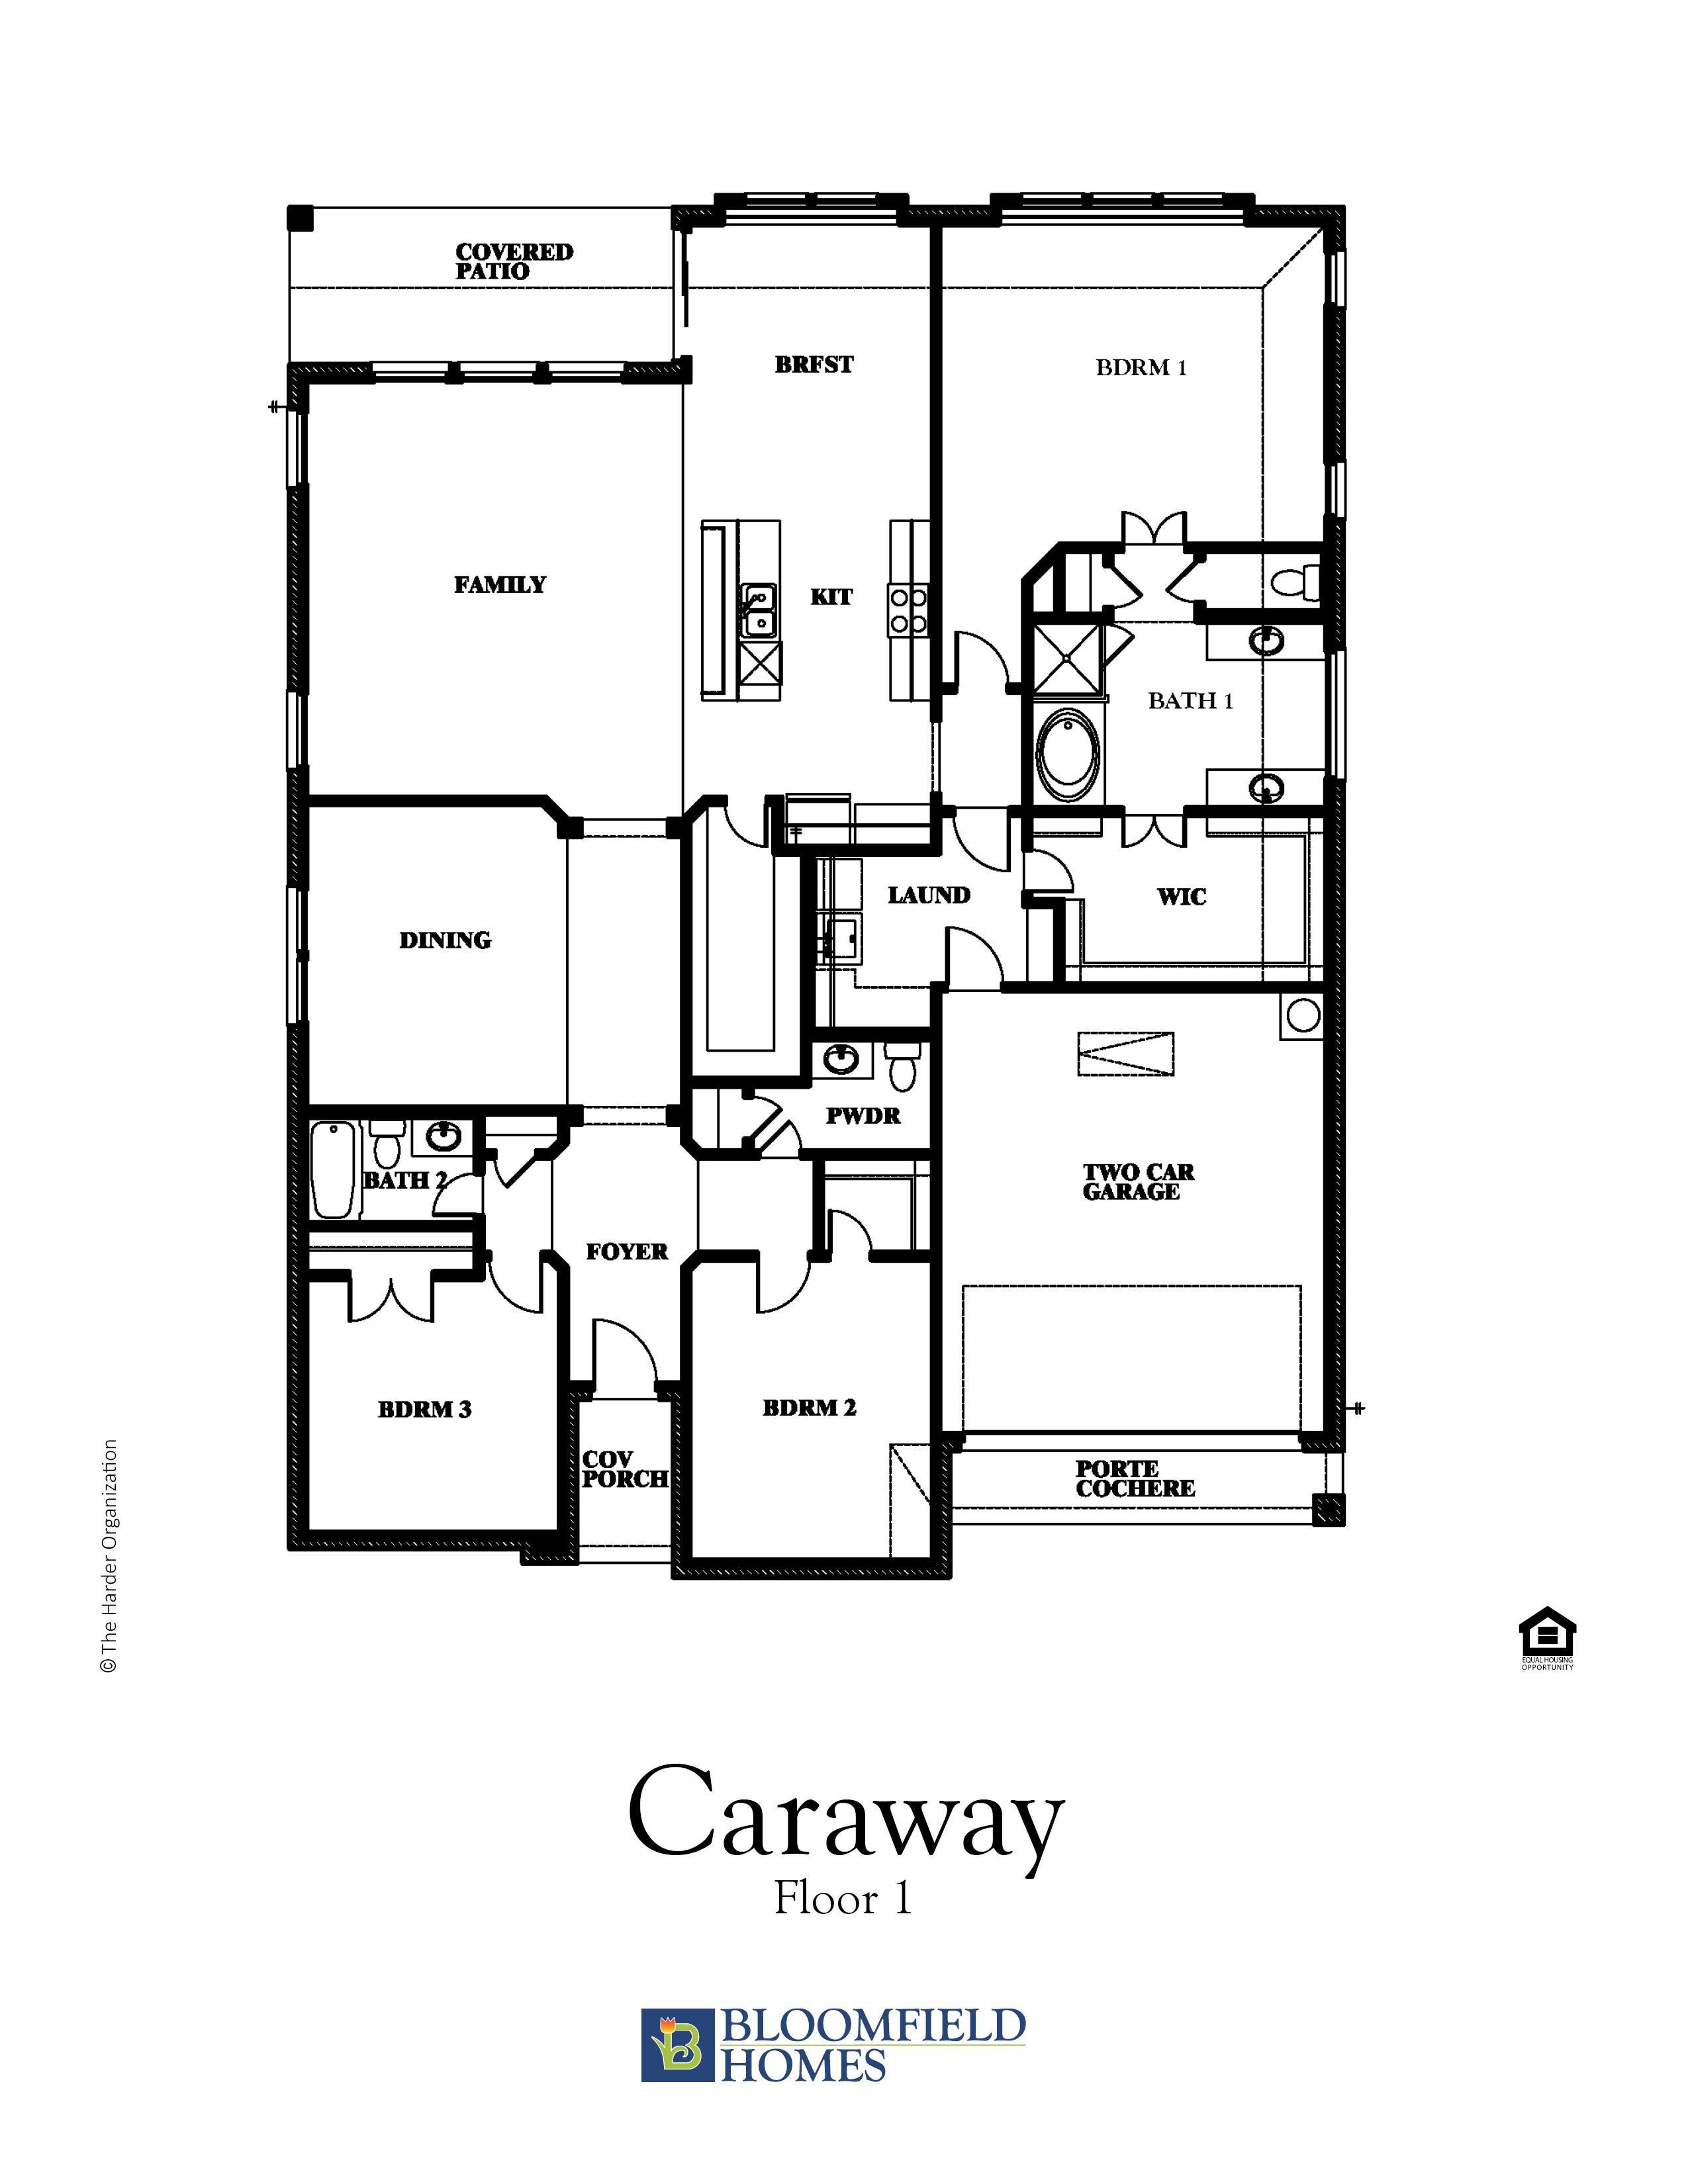 Caraway 1